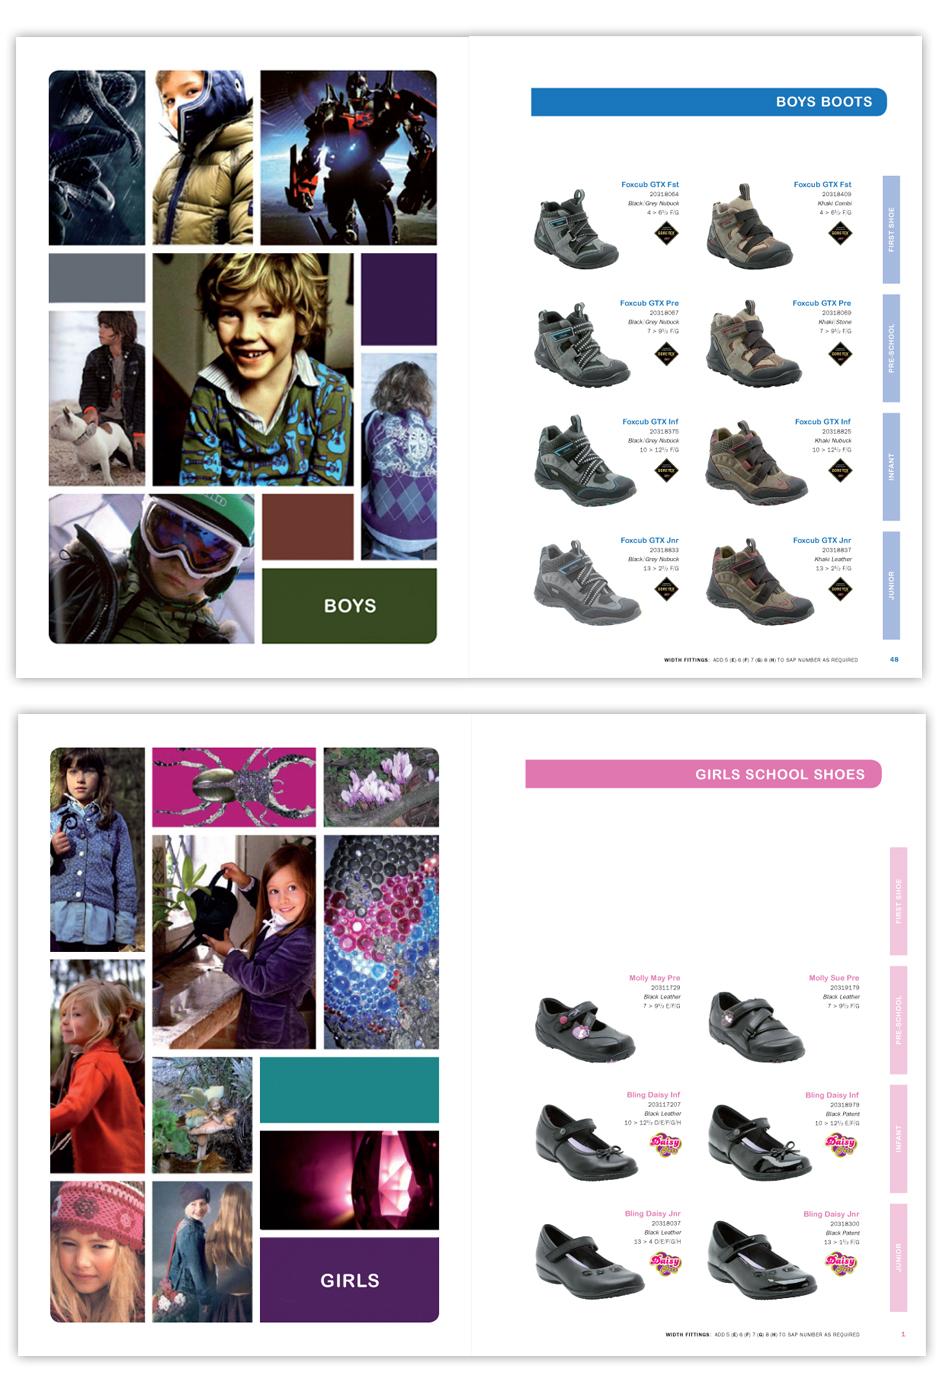 clarks kids catalogue